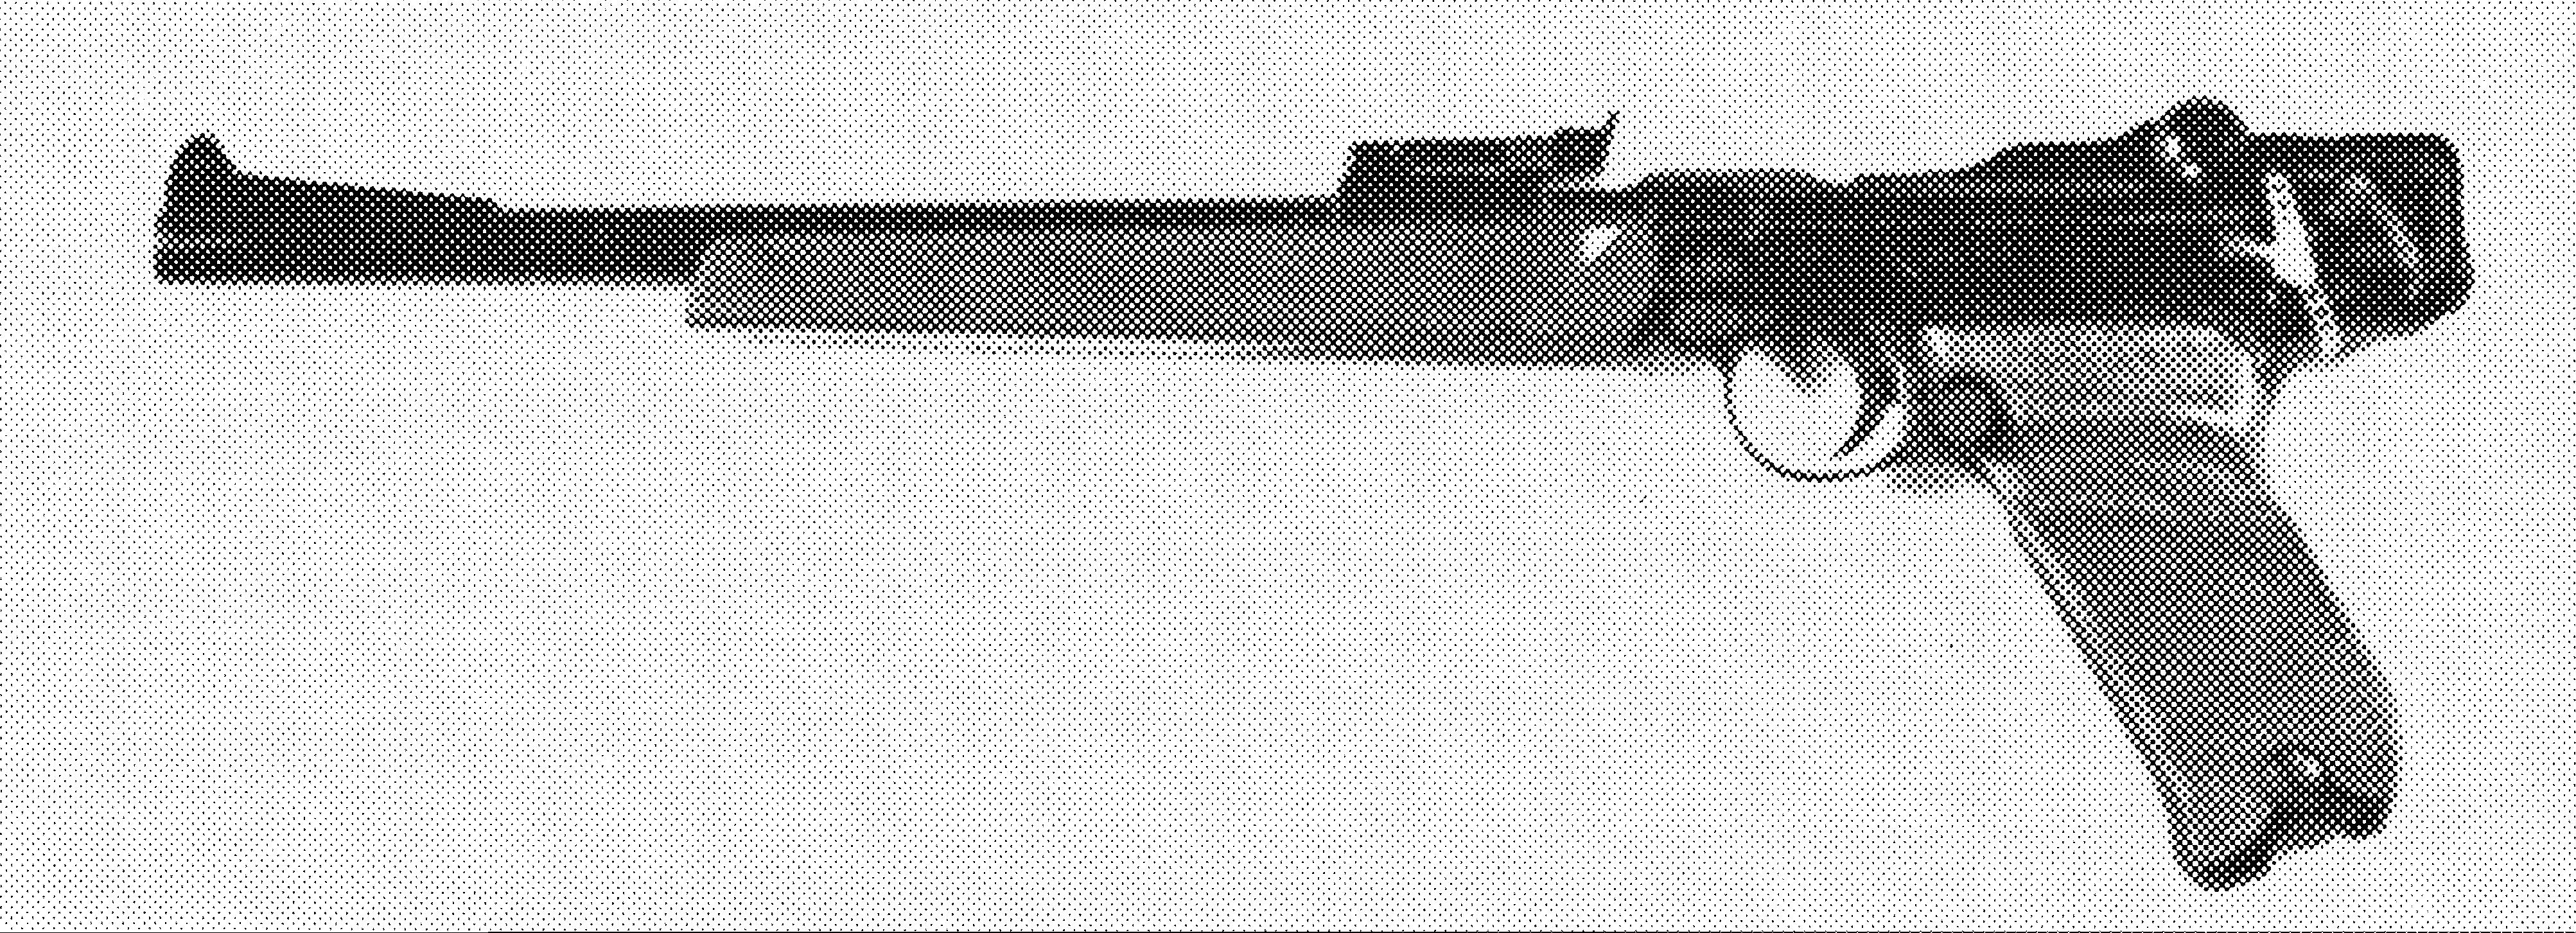 ET-22